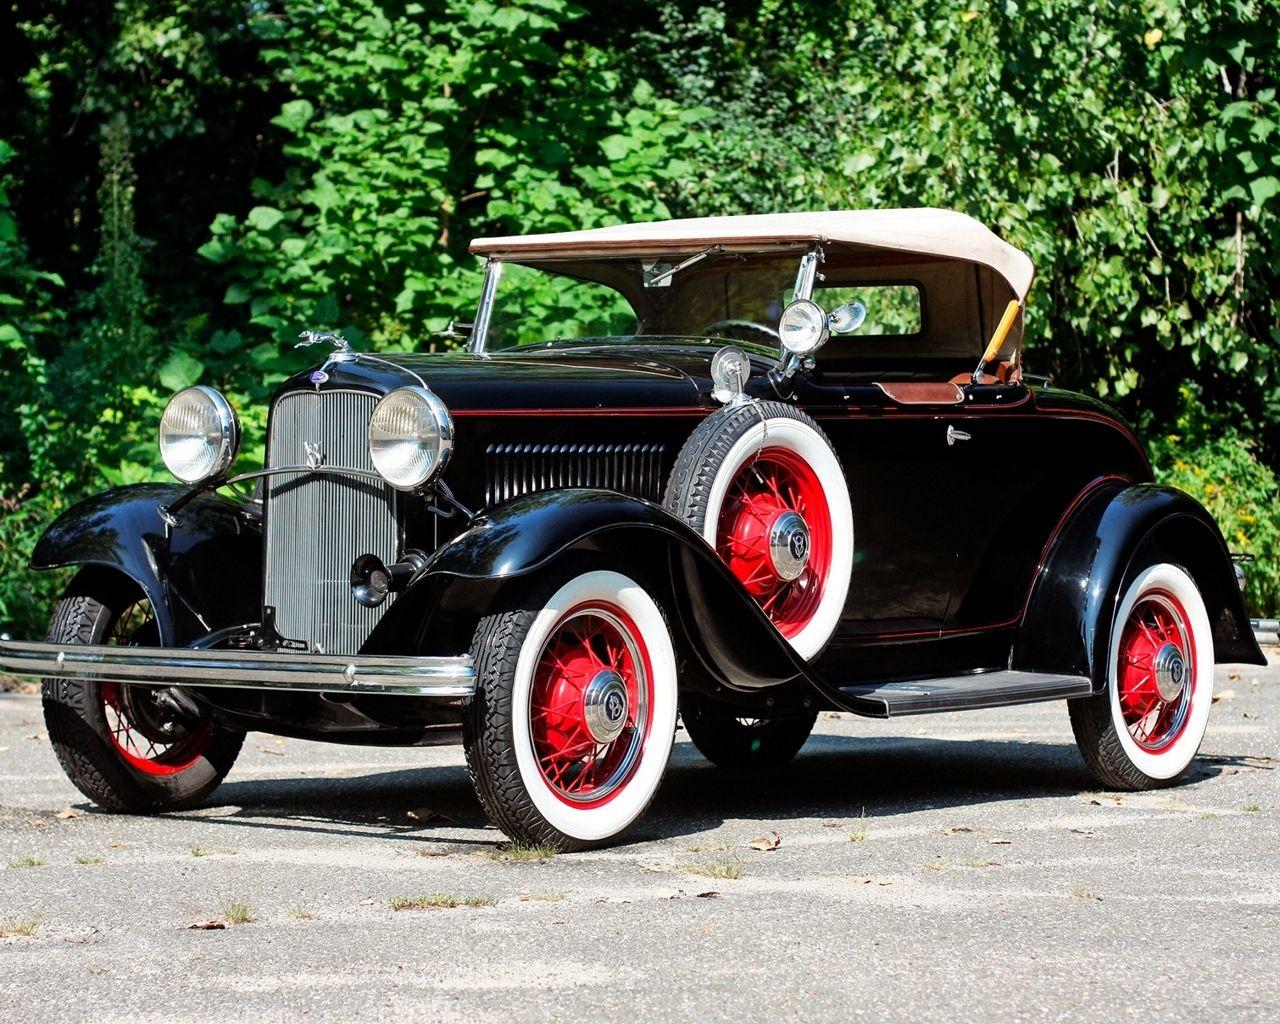 Name: vintage cars image 1280X1024.jpg Views: 5021 Size: 715.6 KB ...